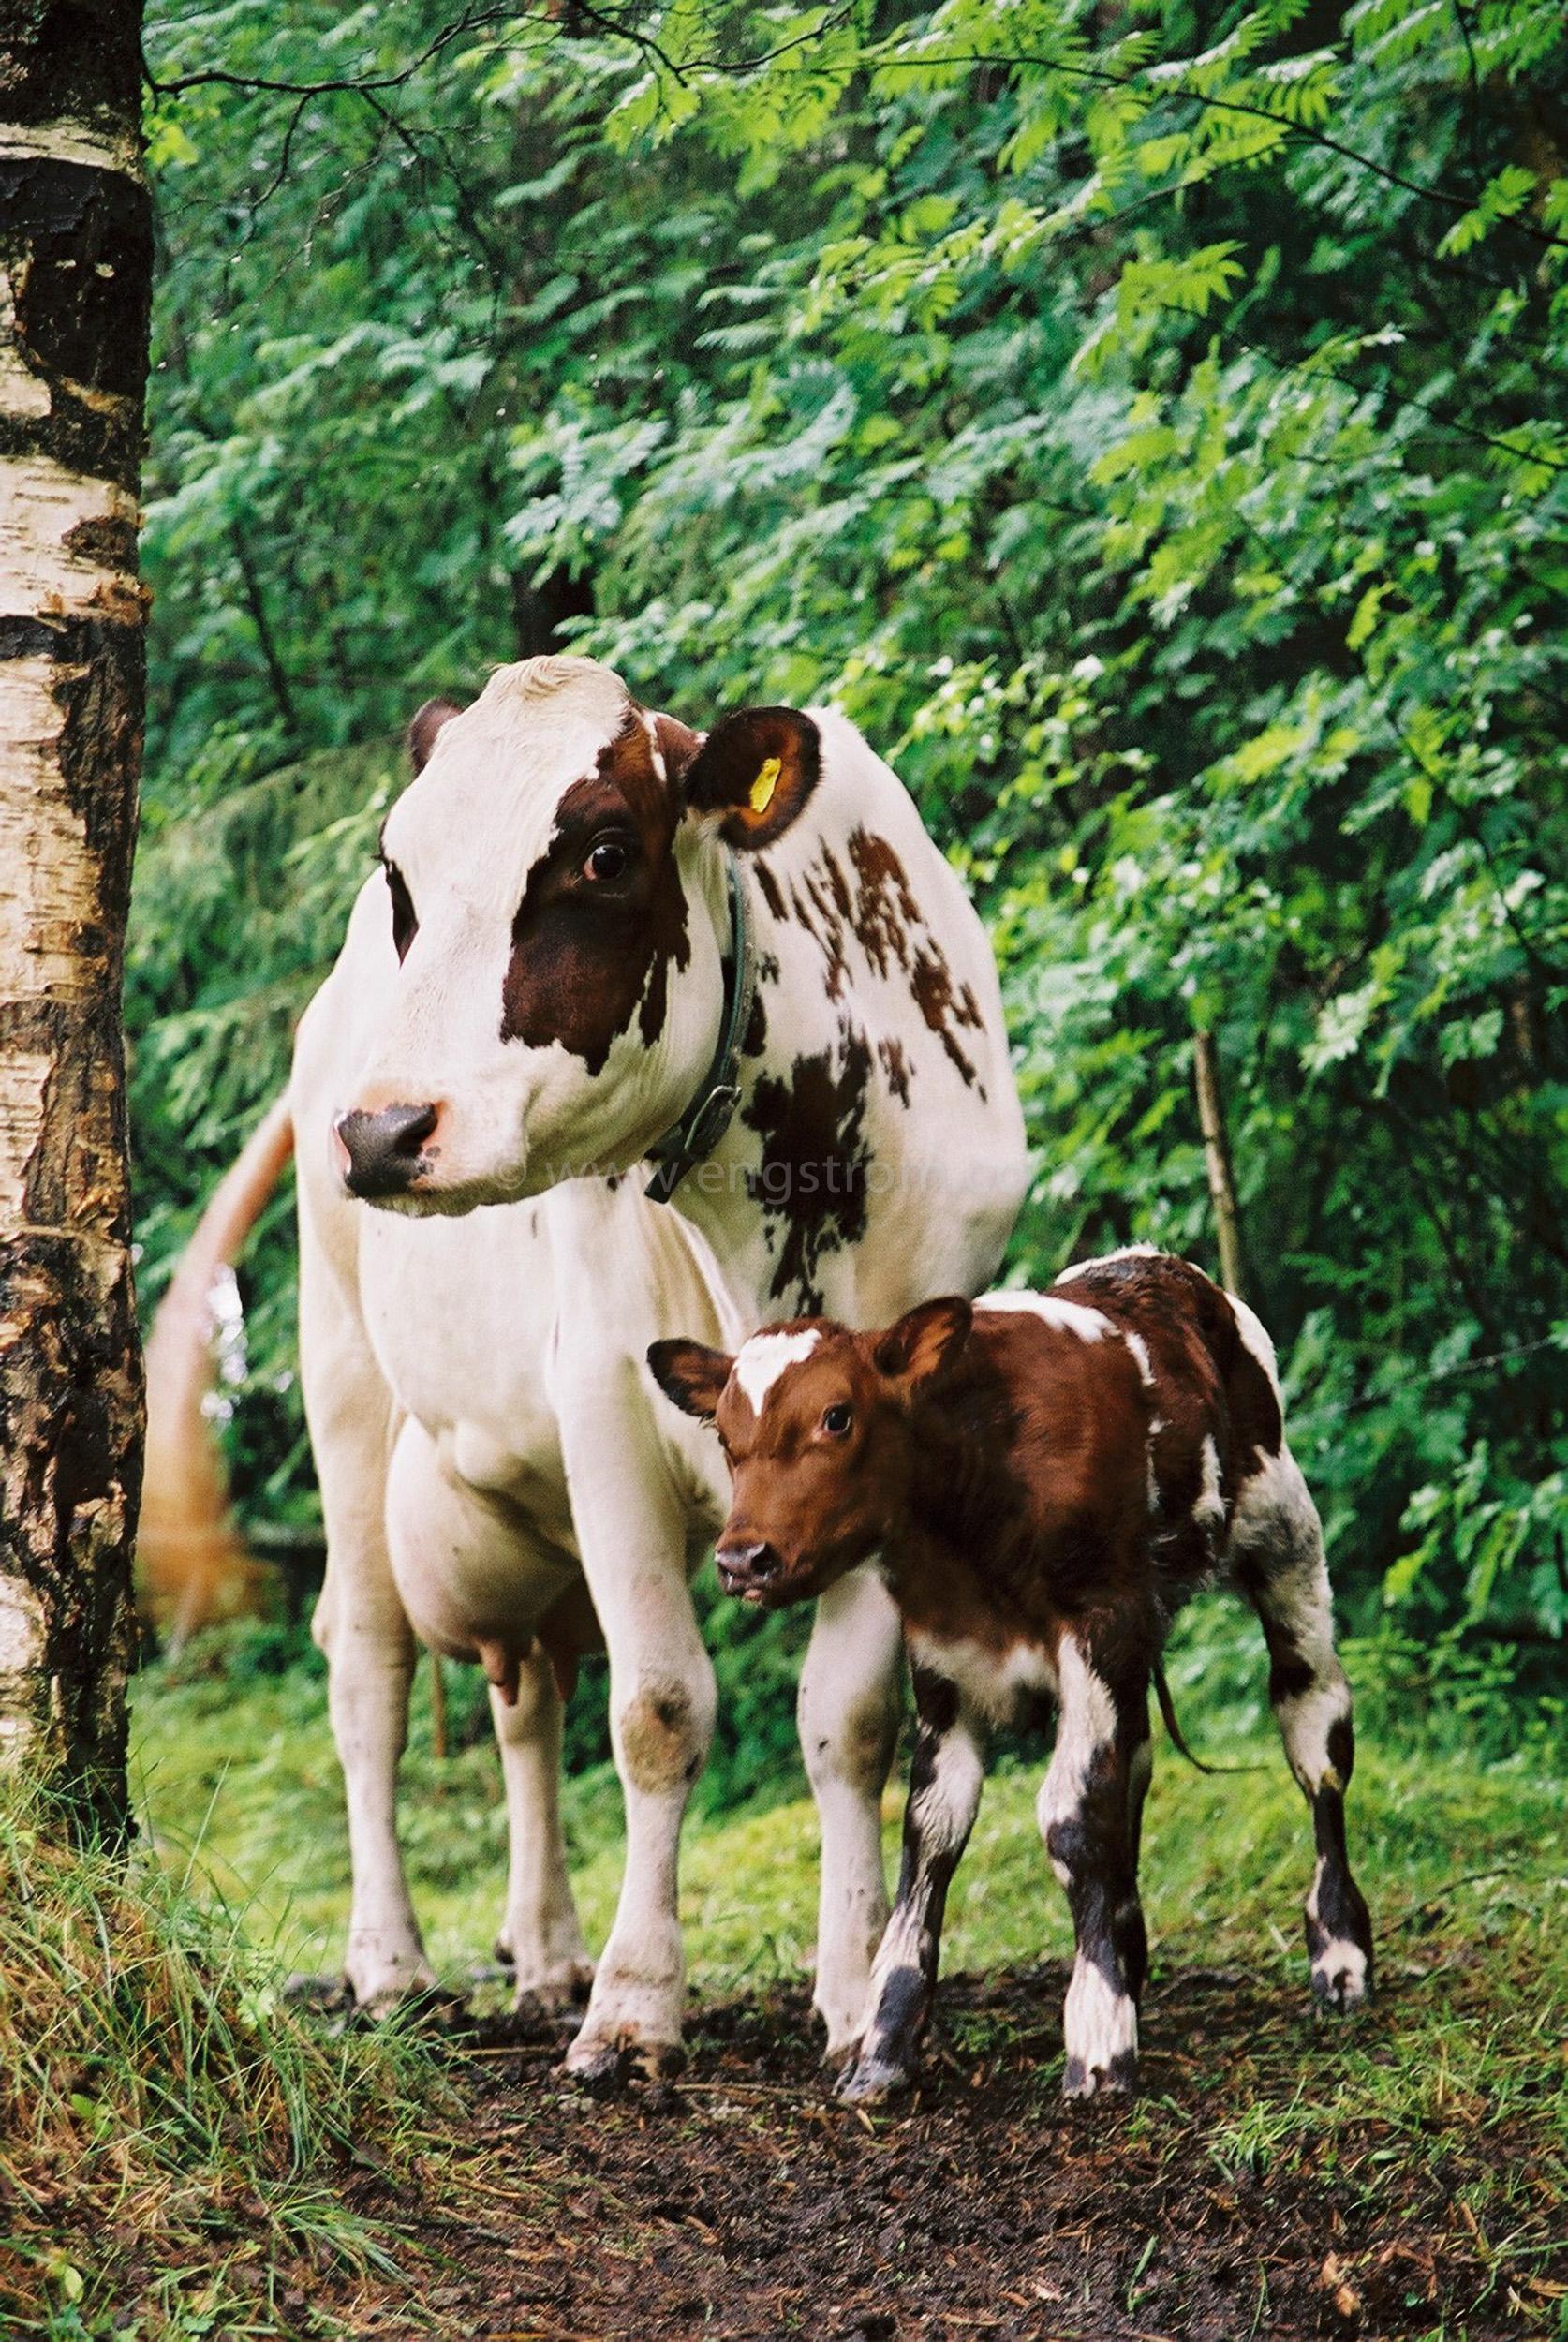 JE0102_06, Ko med nyfödd kalv. Stocksbo sommaren 2001, Jonas Engström